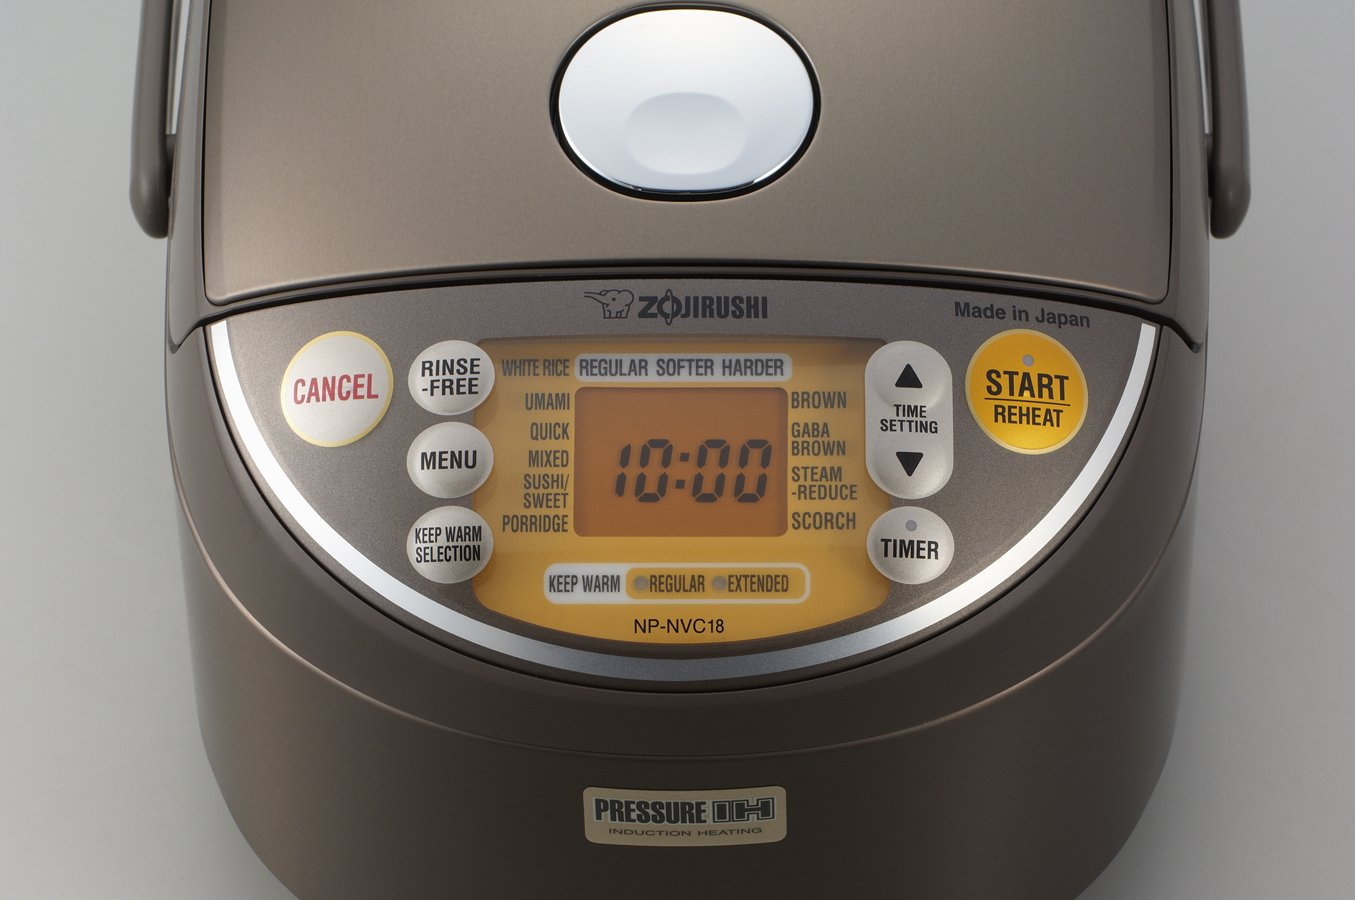 Zojirushi Induction Heating Pressure Rice Cooker & Warmer 1.8 Liter, Stainless Brown NP-NVC18 by Zojirushi (Image #6)